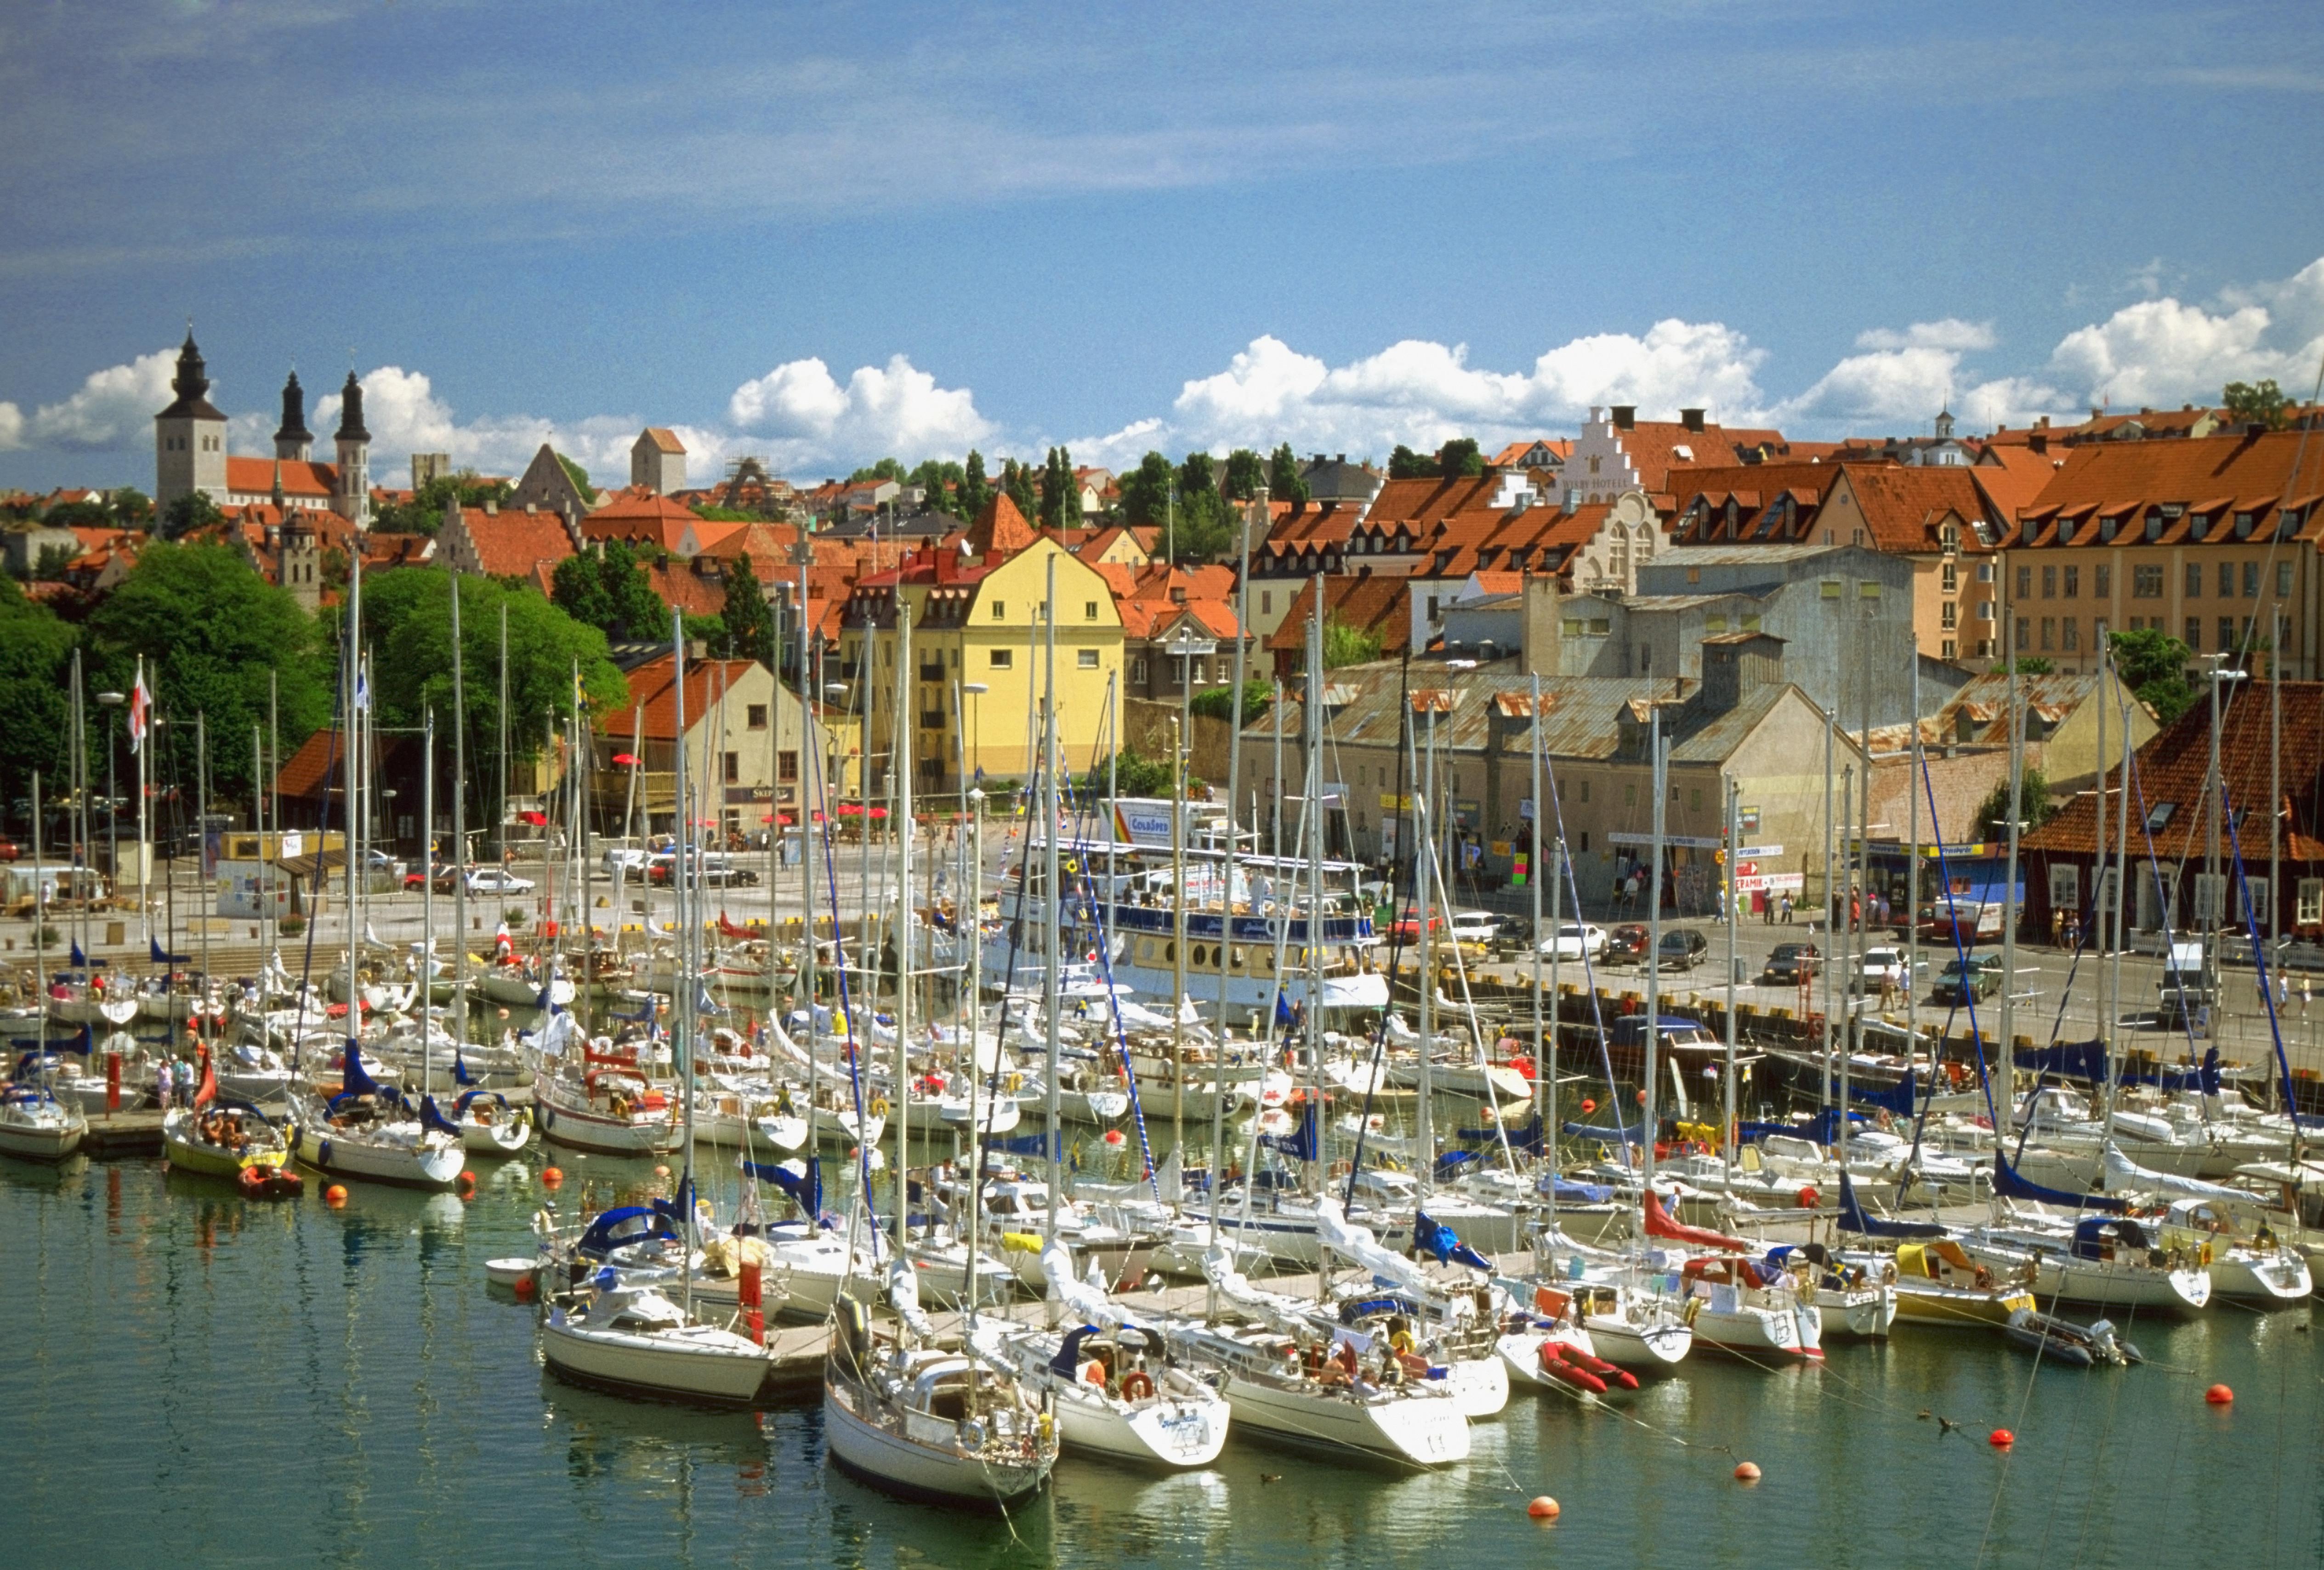 Gotland is one of Sweden's biggest islands